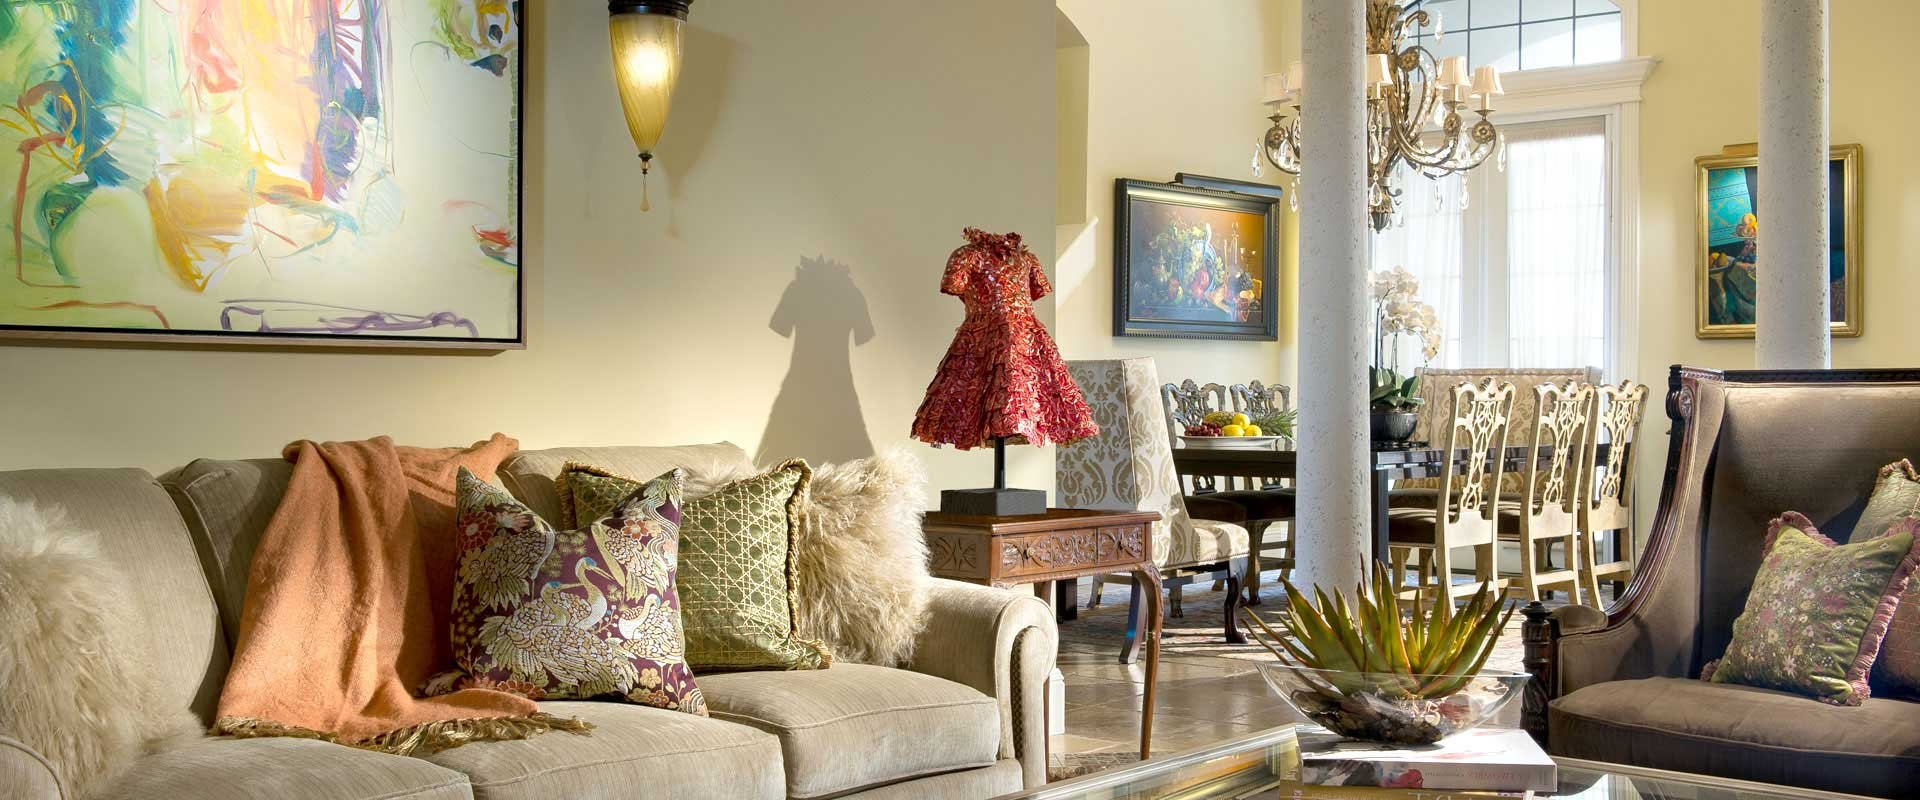 orlando-interior-decorator-angela-neel-dining-room